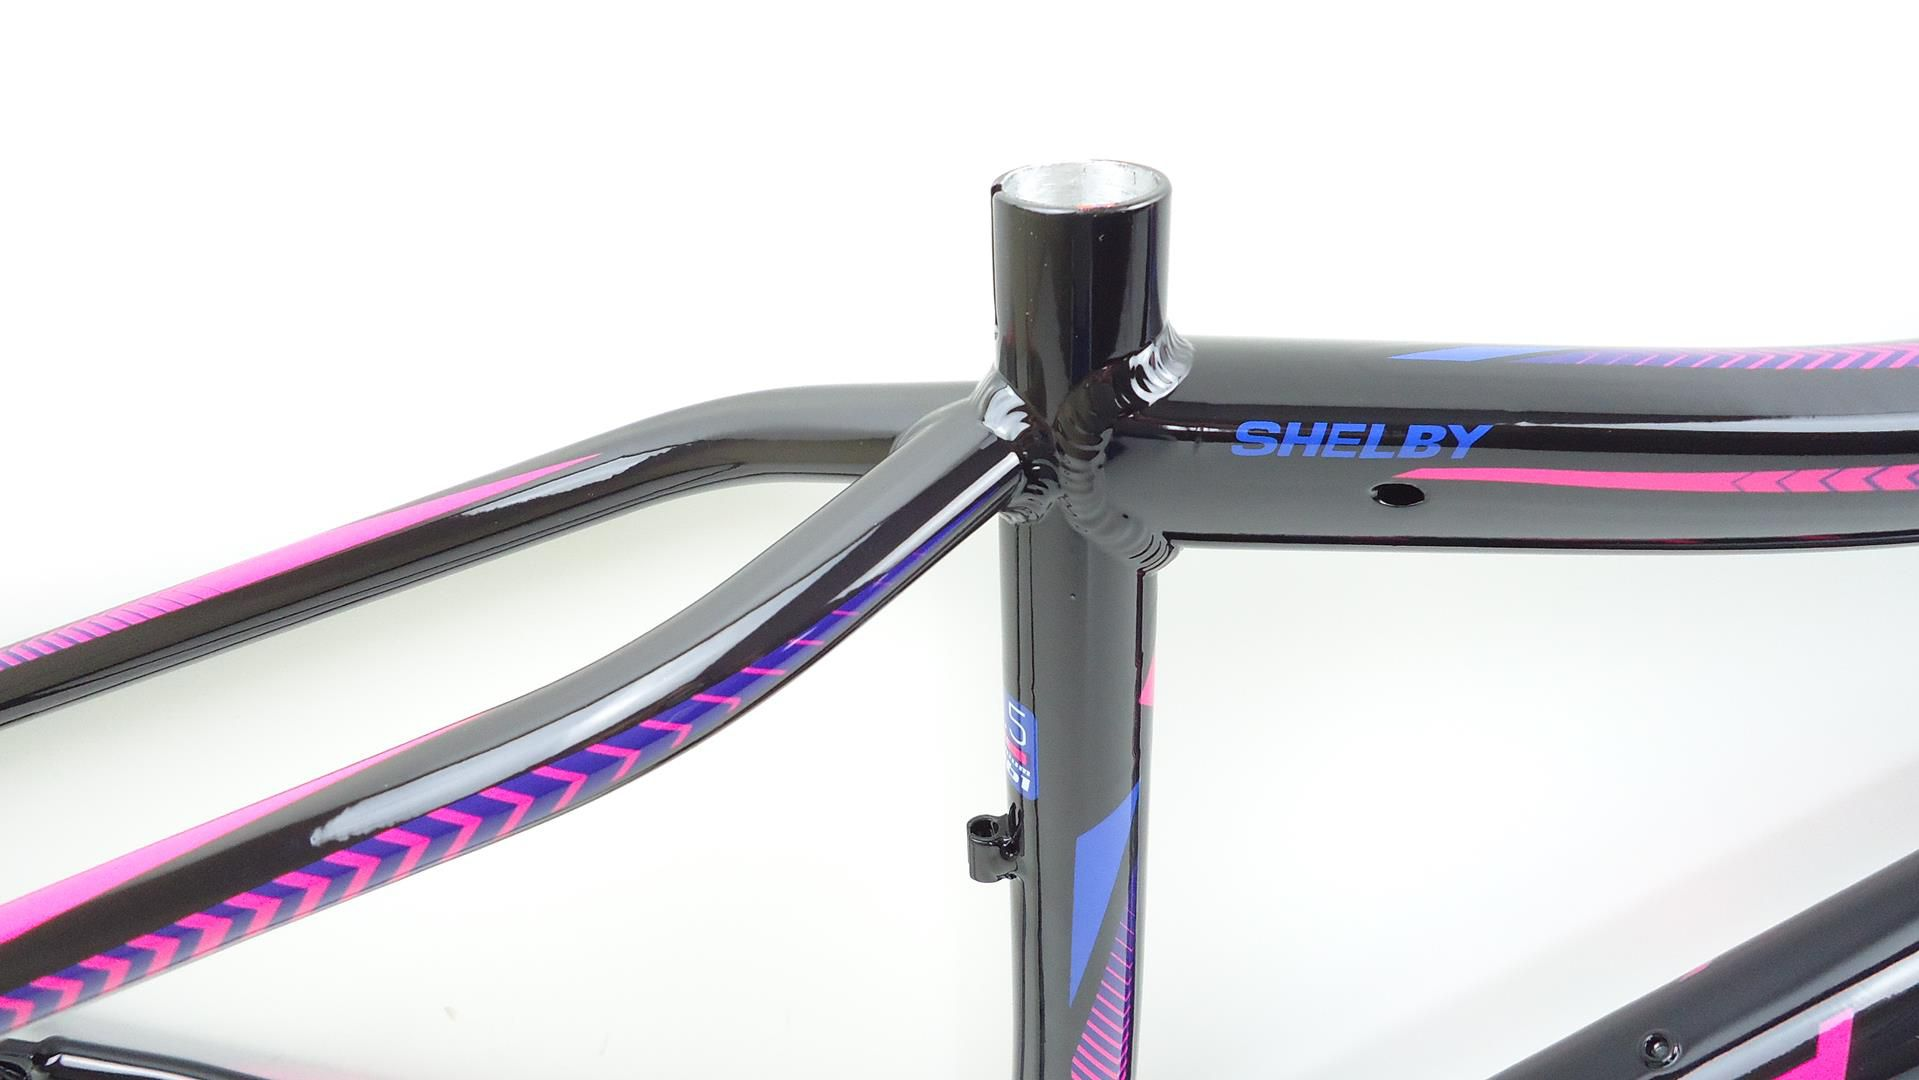 Quadro Mtb First Shelby Feminino Aro 29 Tam 15,5 Preto Rosa/Azul + Brinde